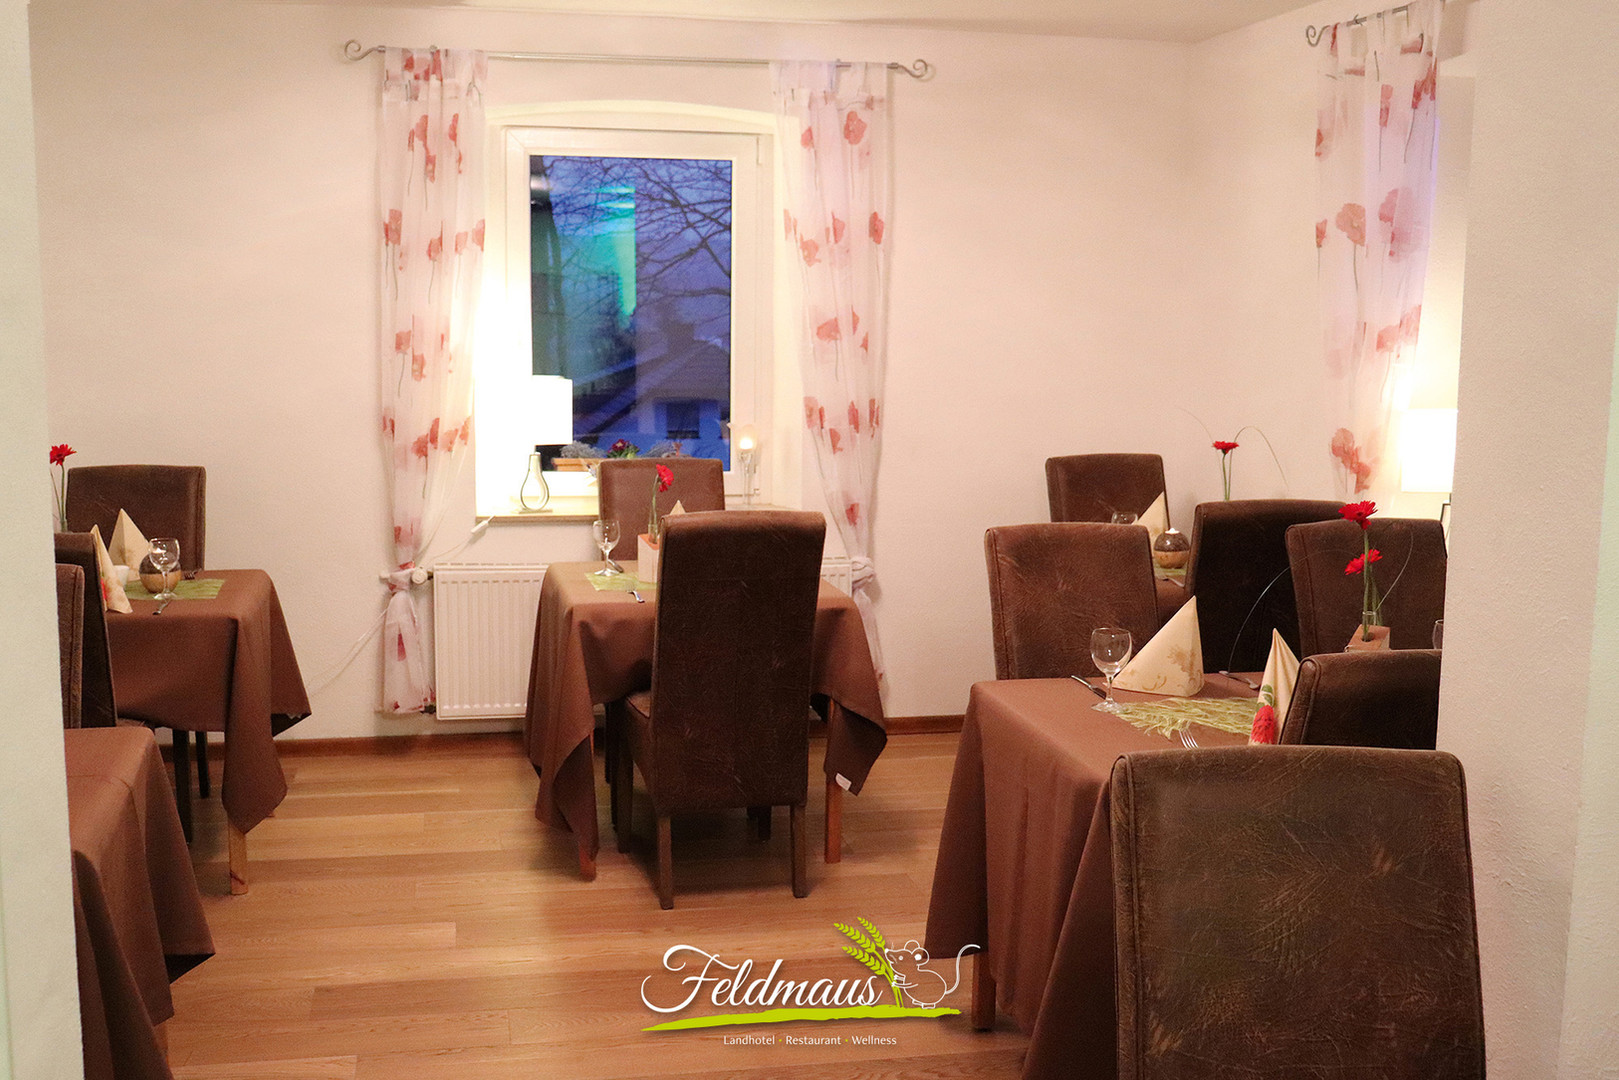 hotel-feldmaus-olzheim-restaurant_5.jpg